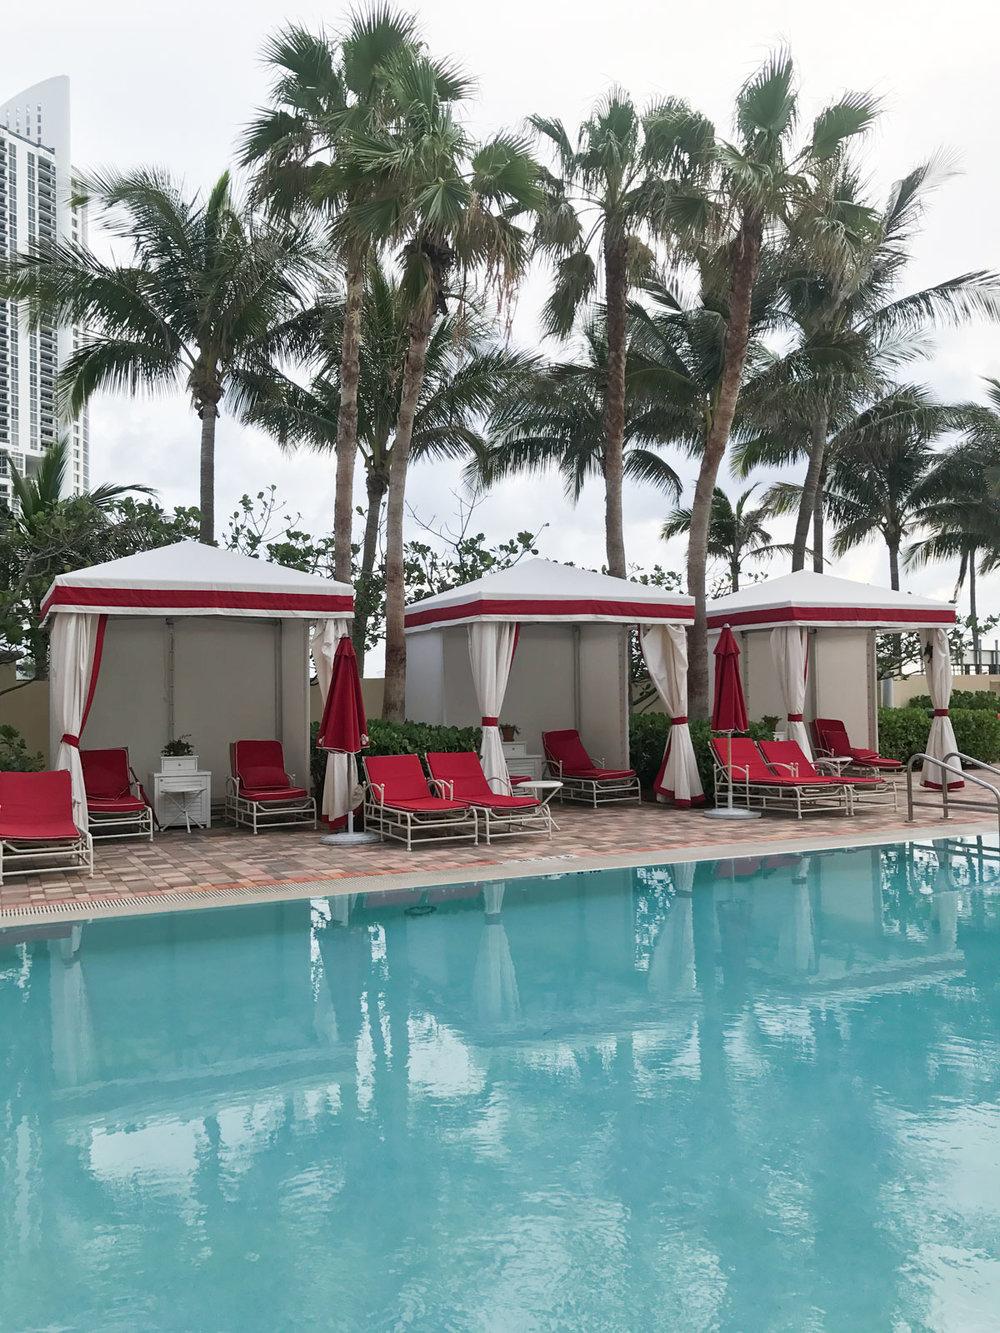 Acqualina Resort Reviews_AddieBell_Best_US_Getaway-8535.jpg